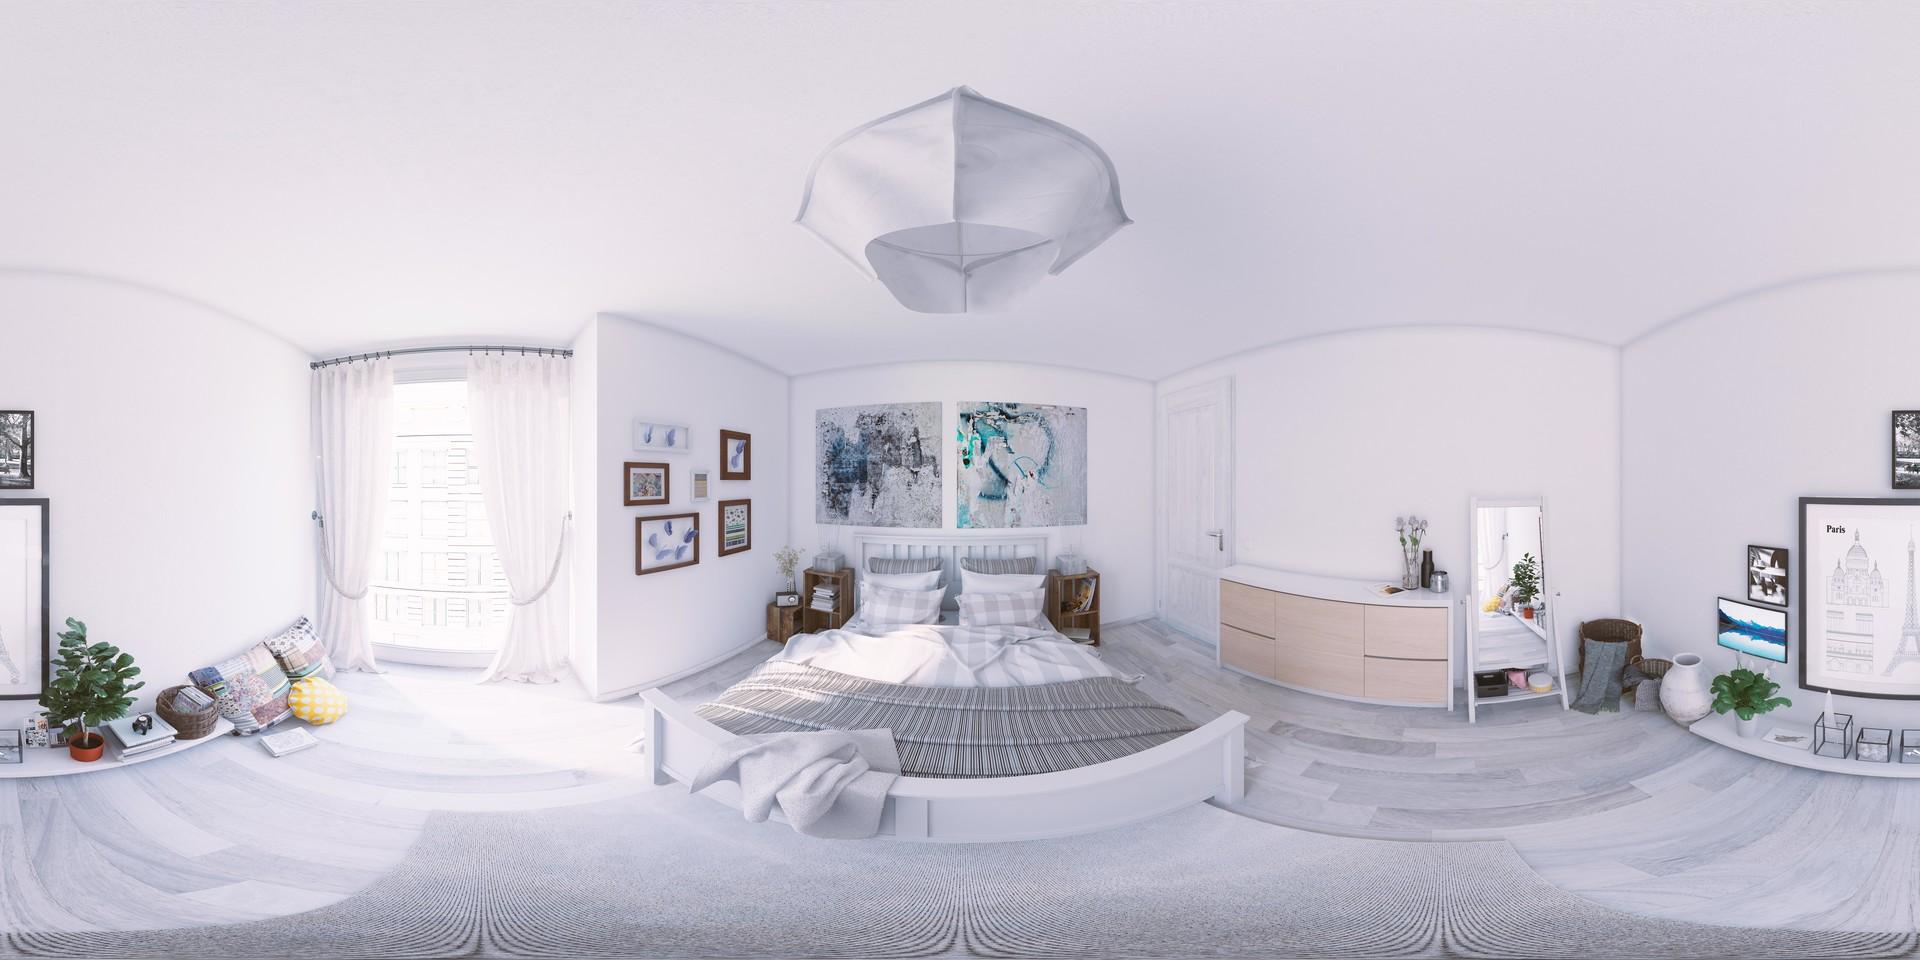 Francois bethermin bedroom05 3